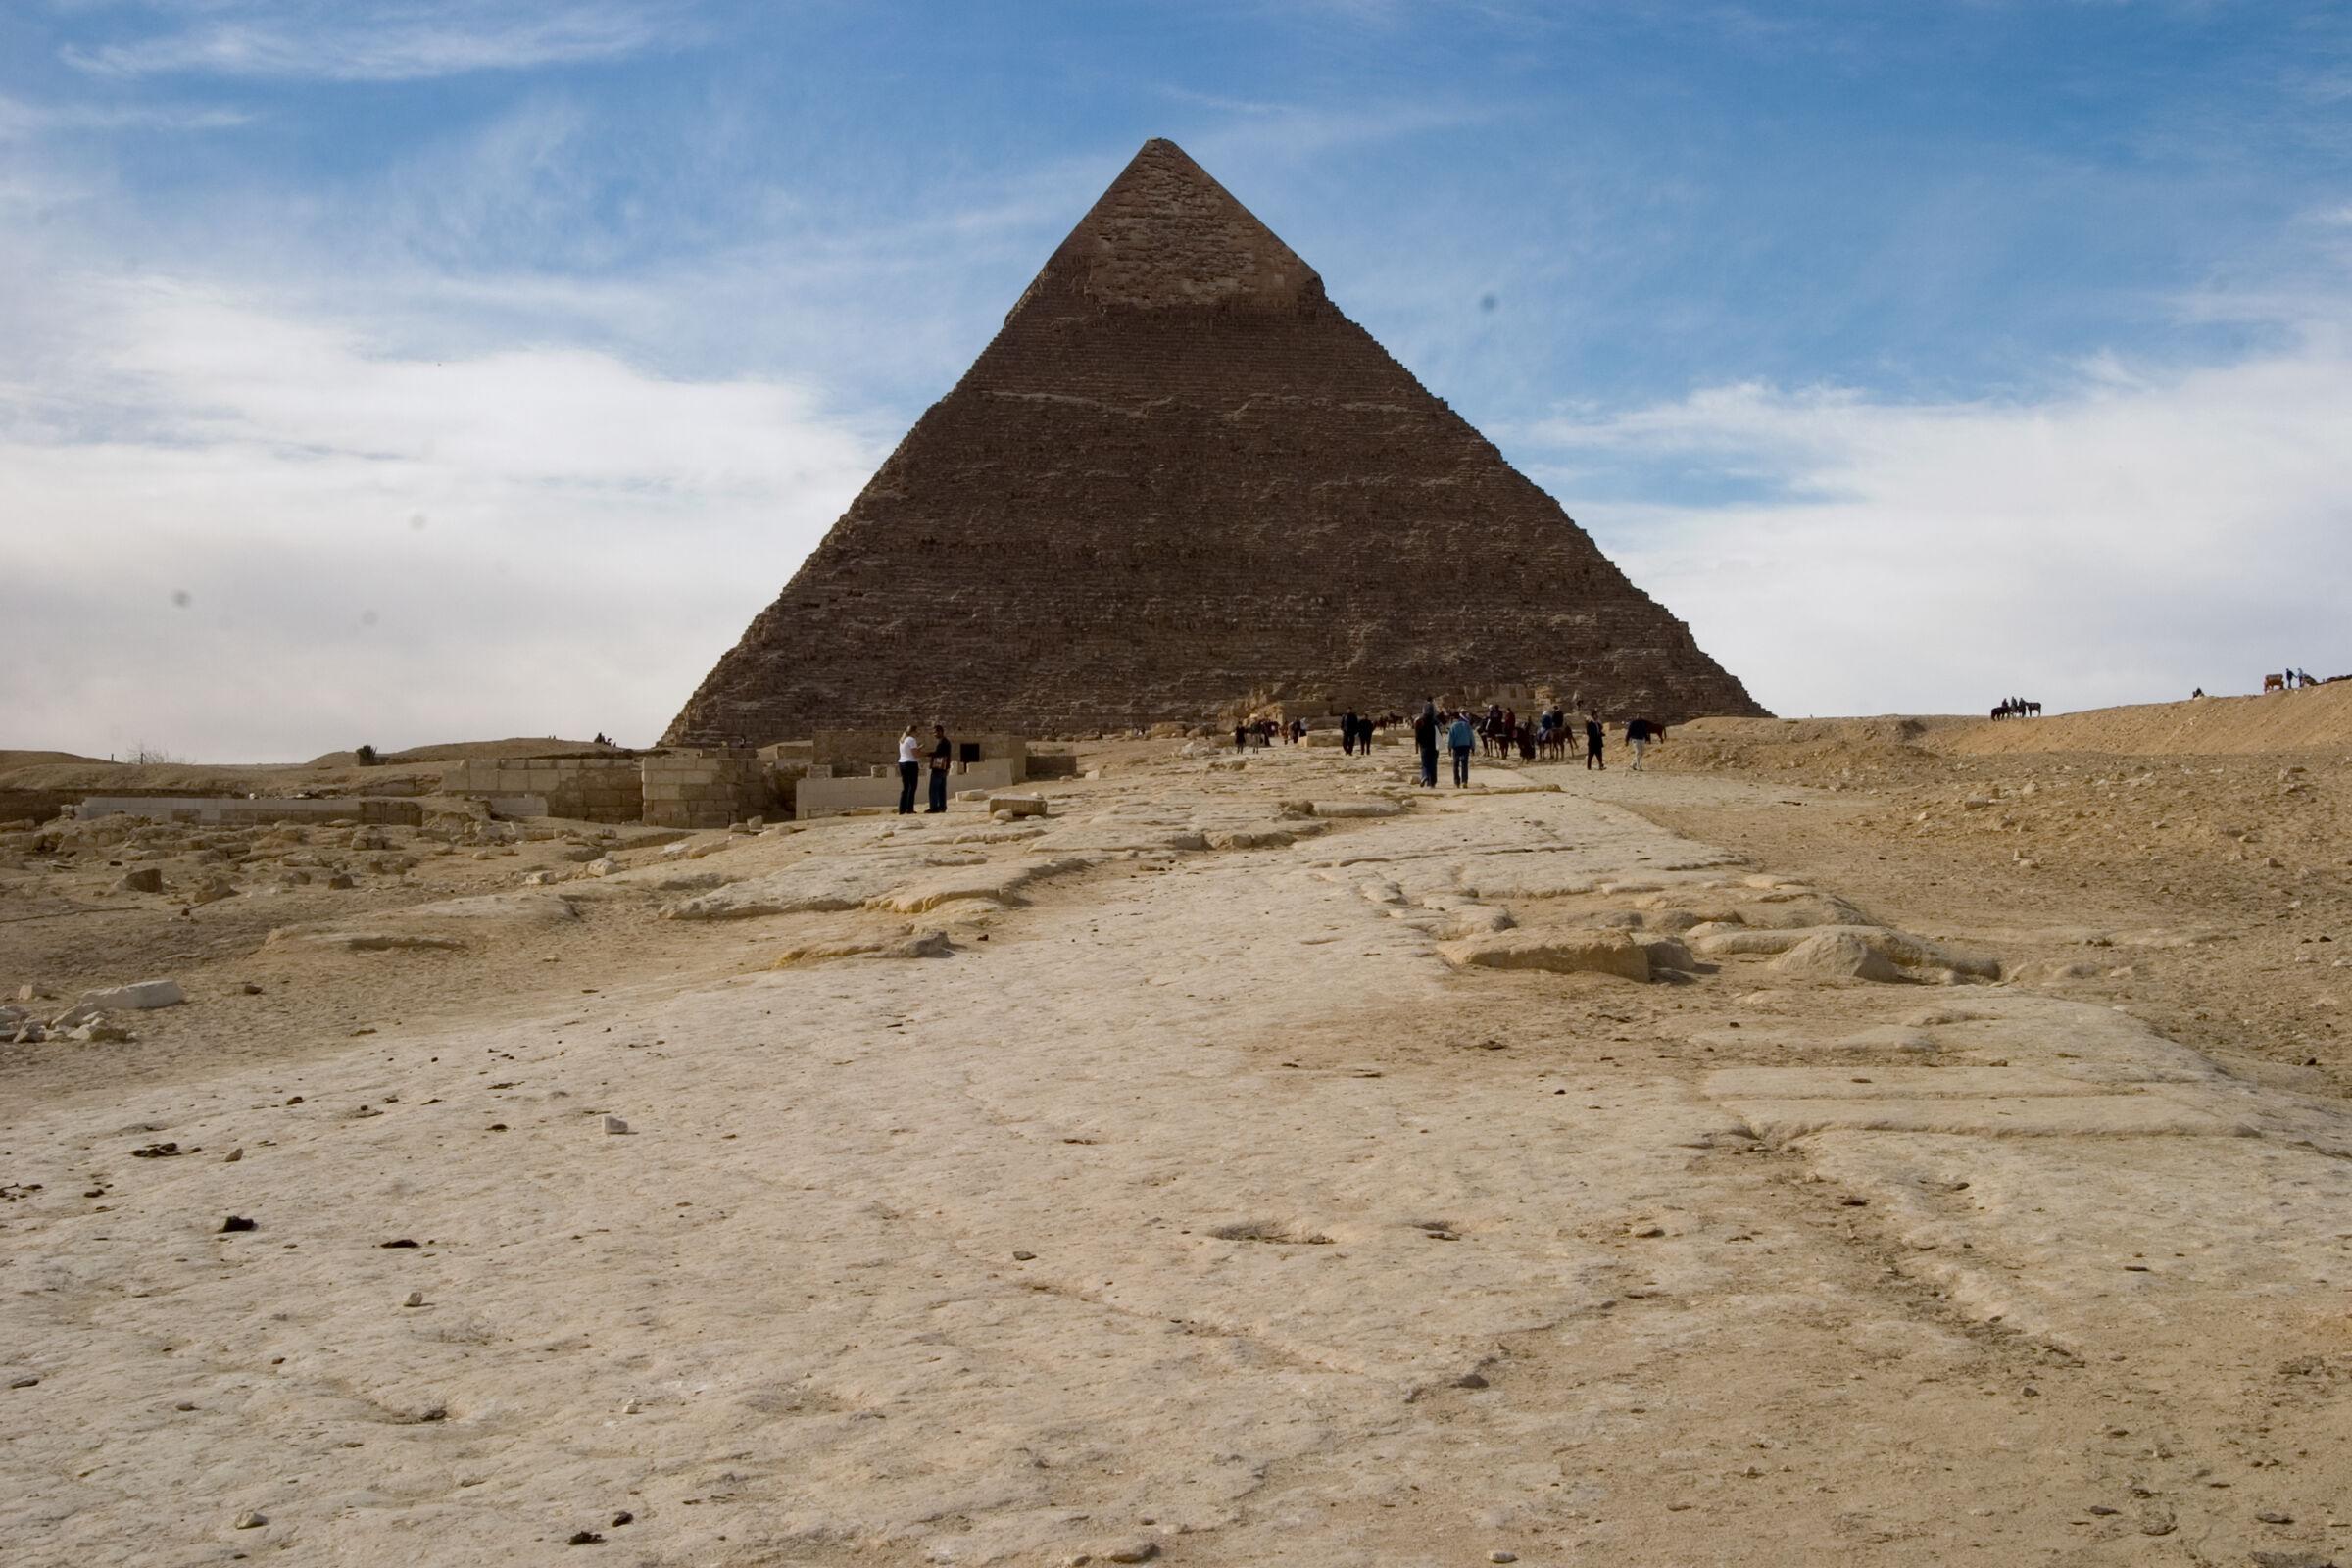 Khafre pyramid and or pyramid temple: Site: Giza; View: Khafre pyramid